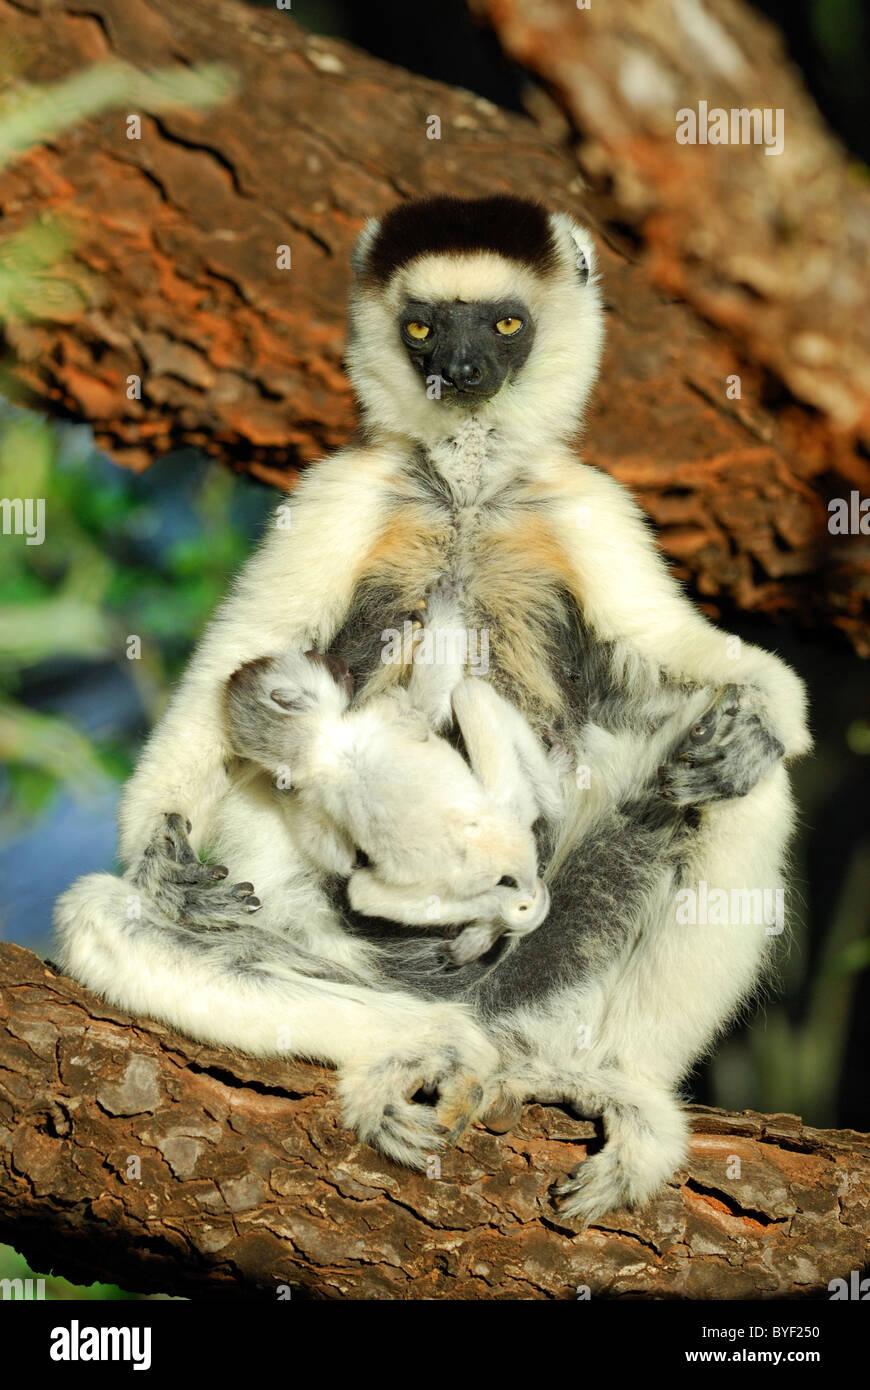 Müde Mutter Verreaux Sifaka (Propithecus Verreauxi) mit ihrem Baby, Madagaskar Stockbild